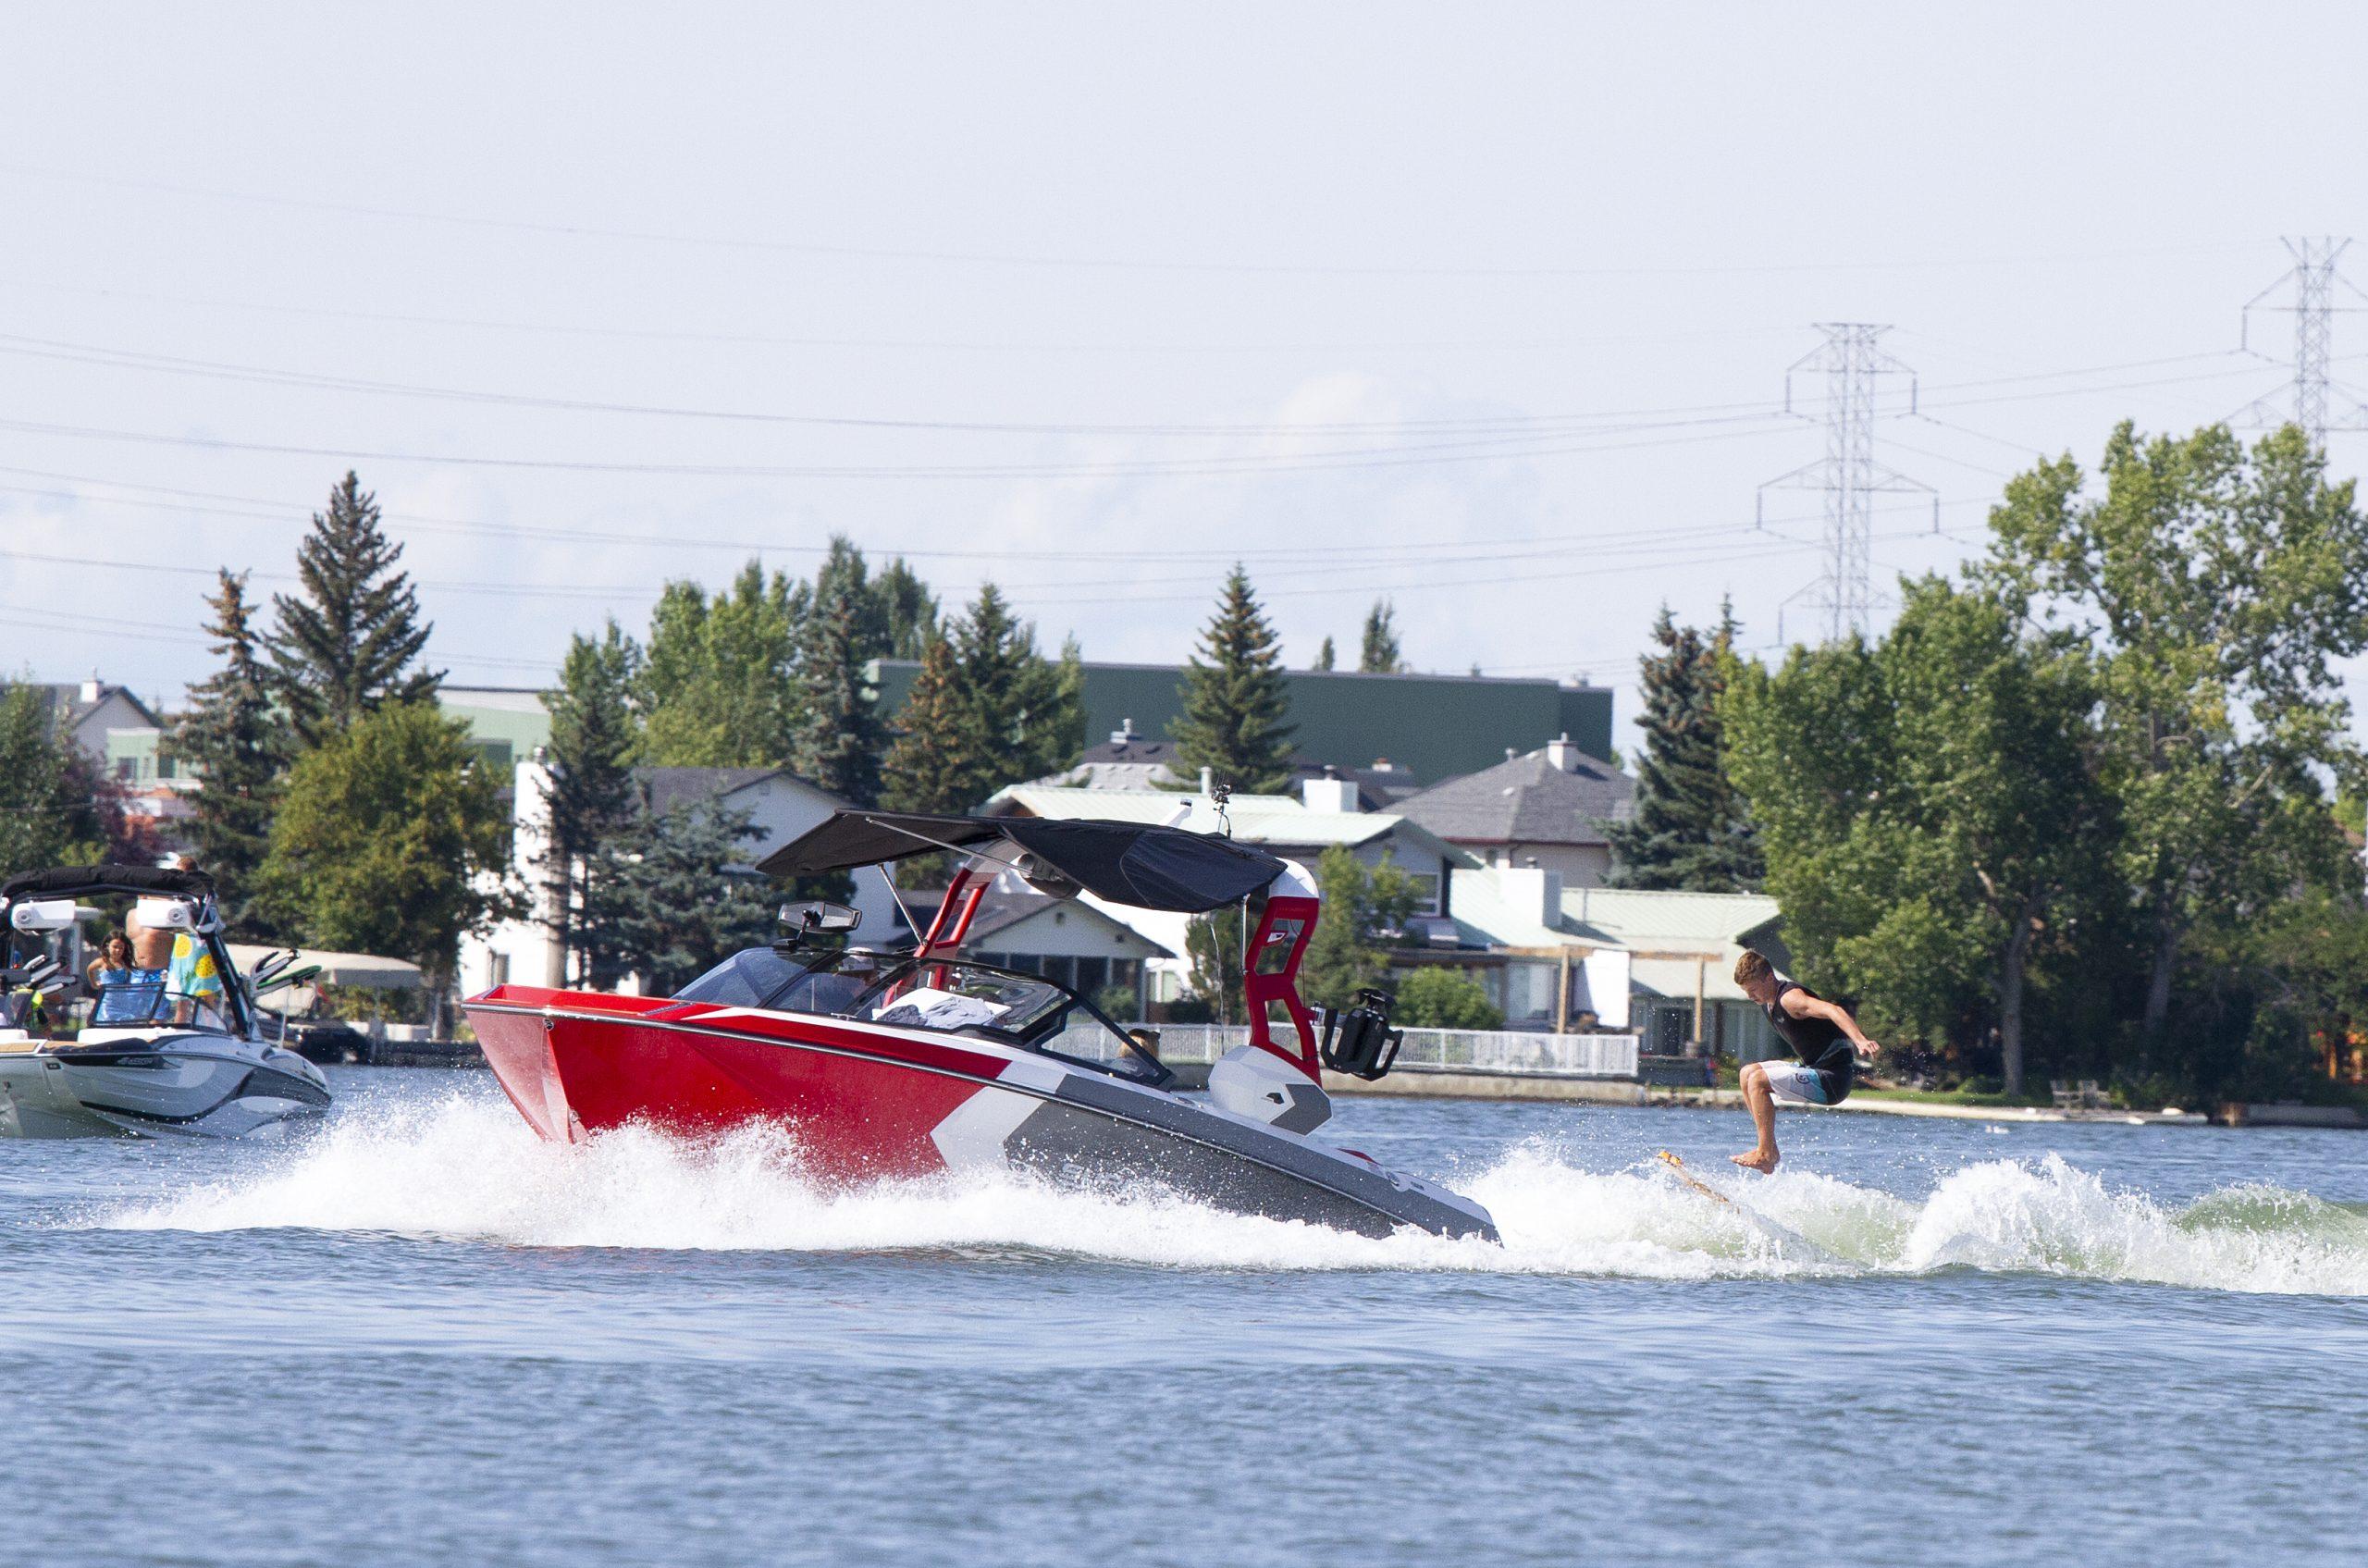 East Kootenay athletes shine at Canadian Wakesurf National